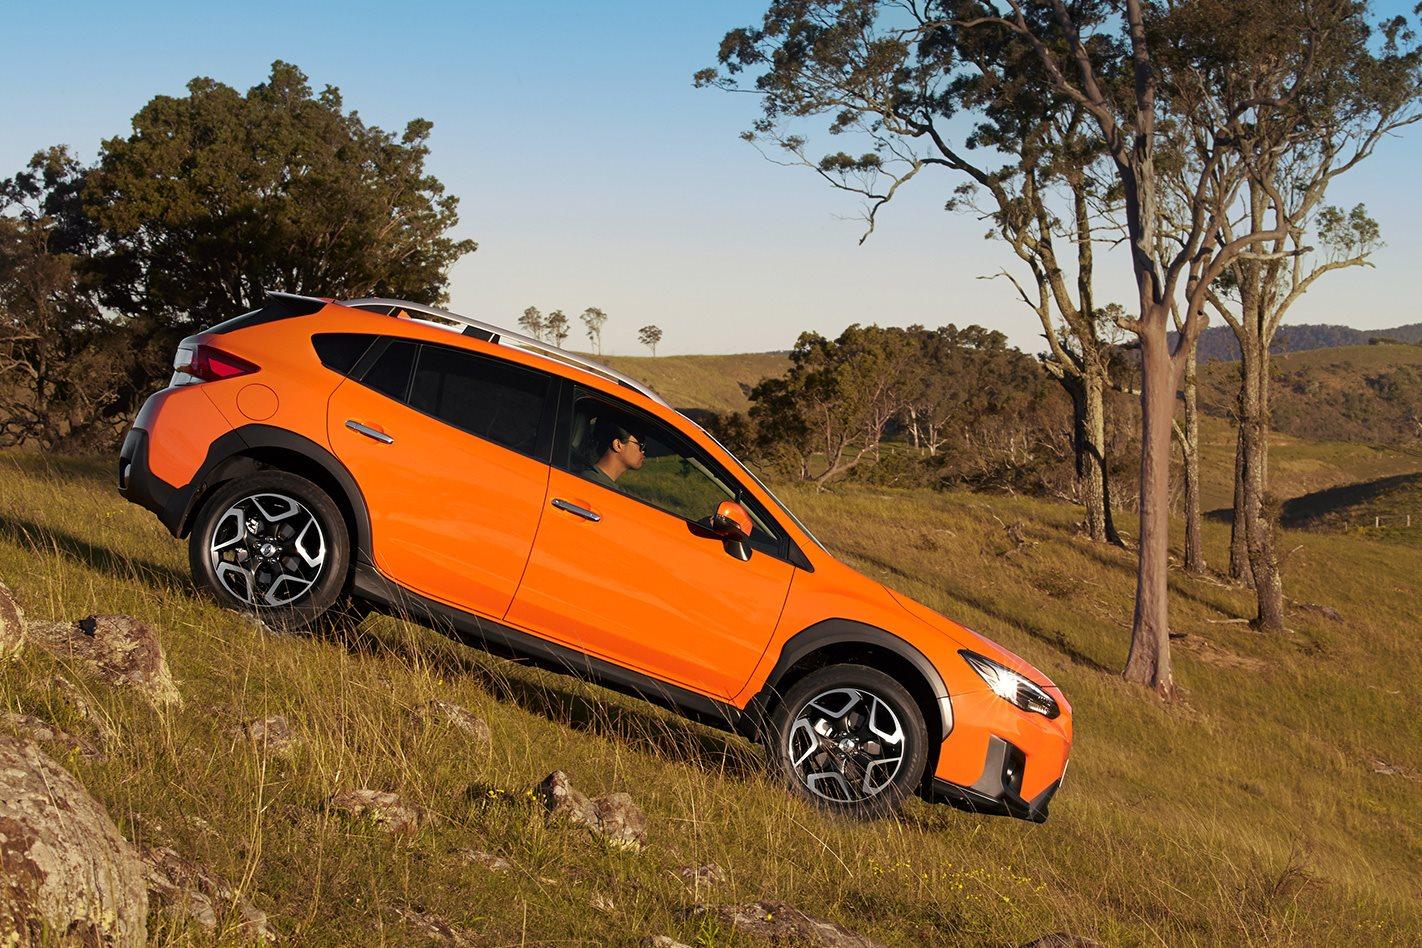 Washington road rage: Subaru rams Jeep three times for passing on shoulder